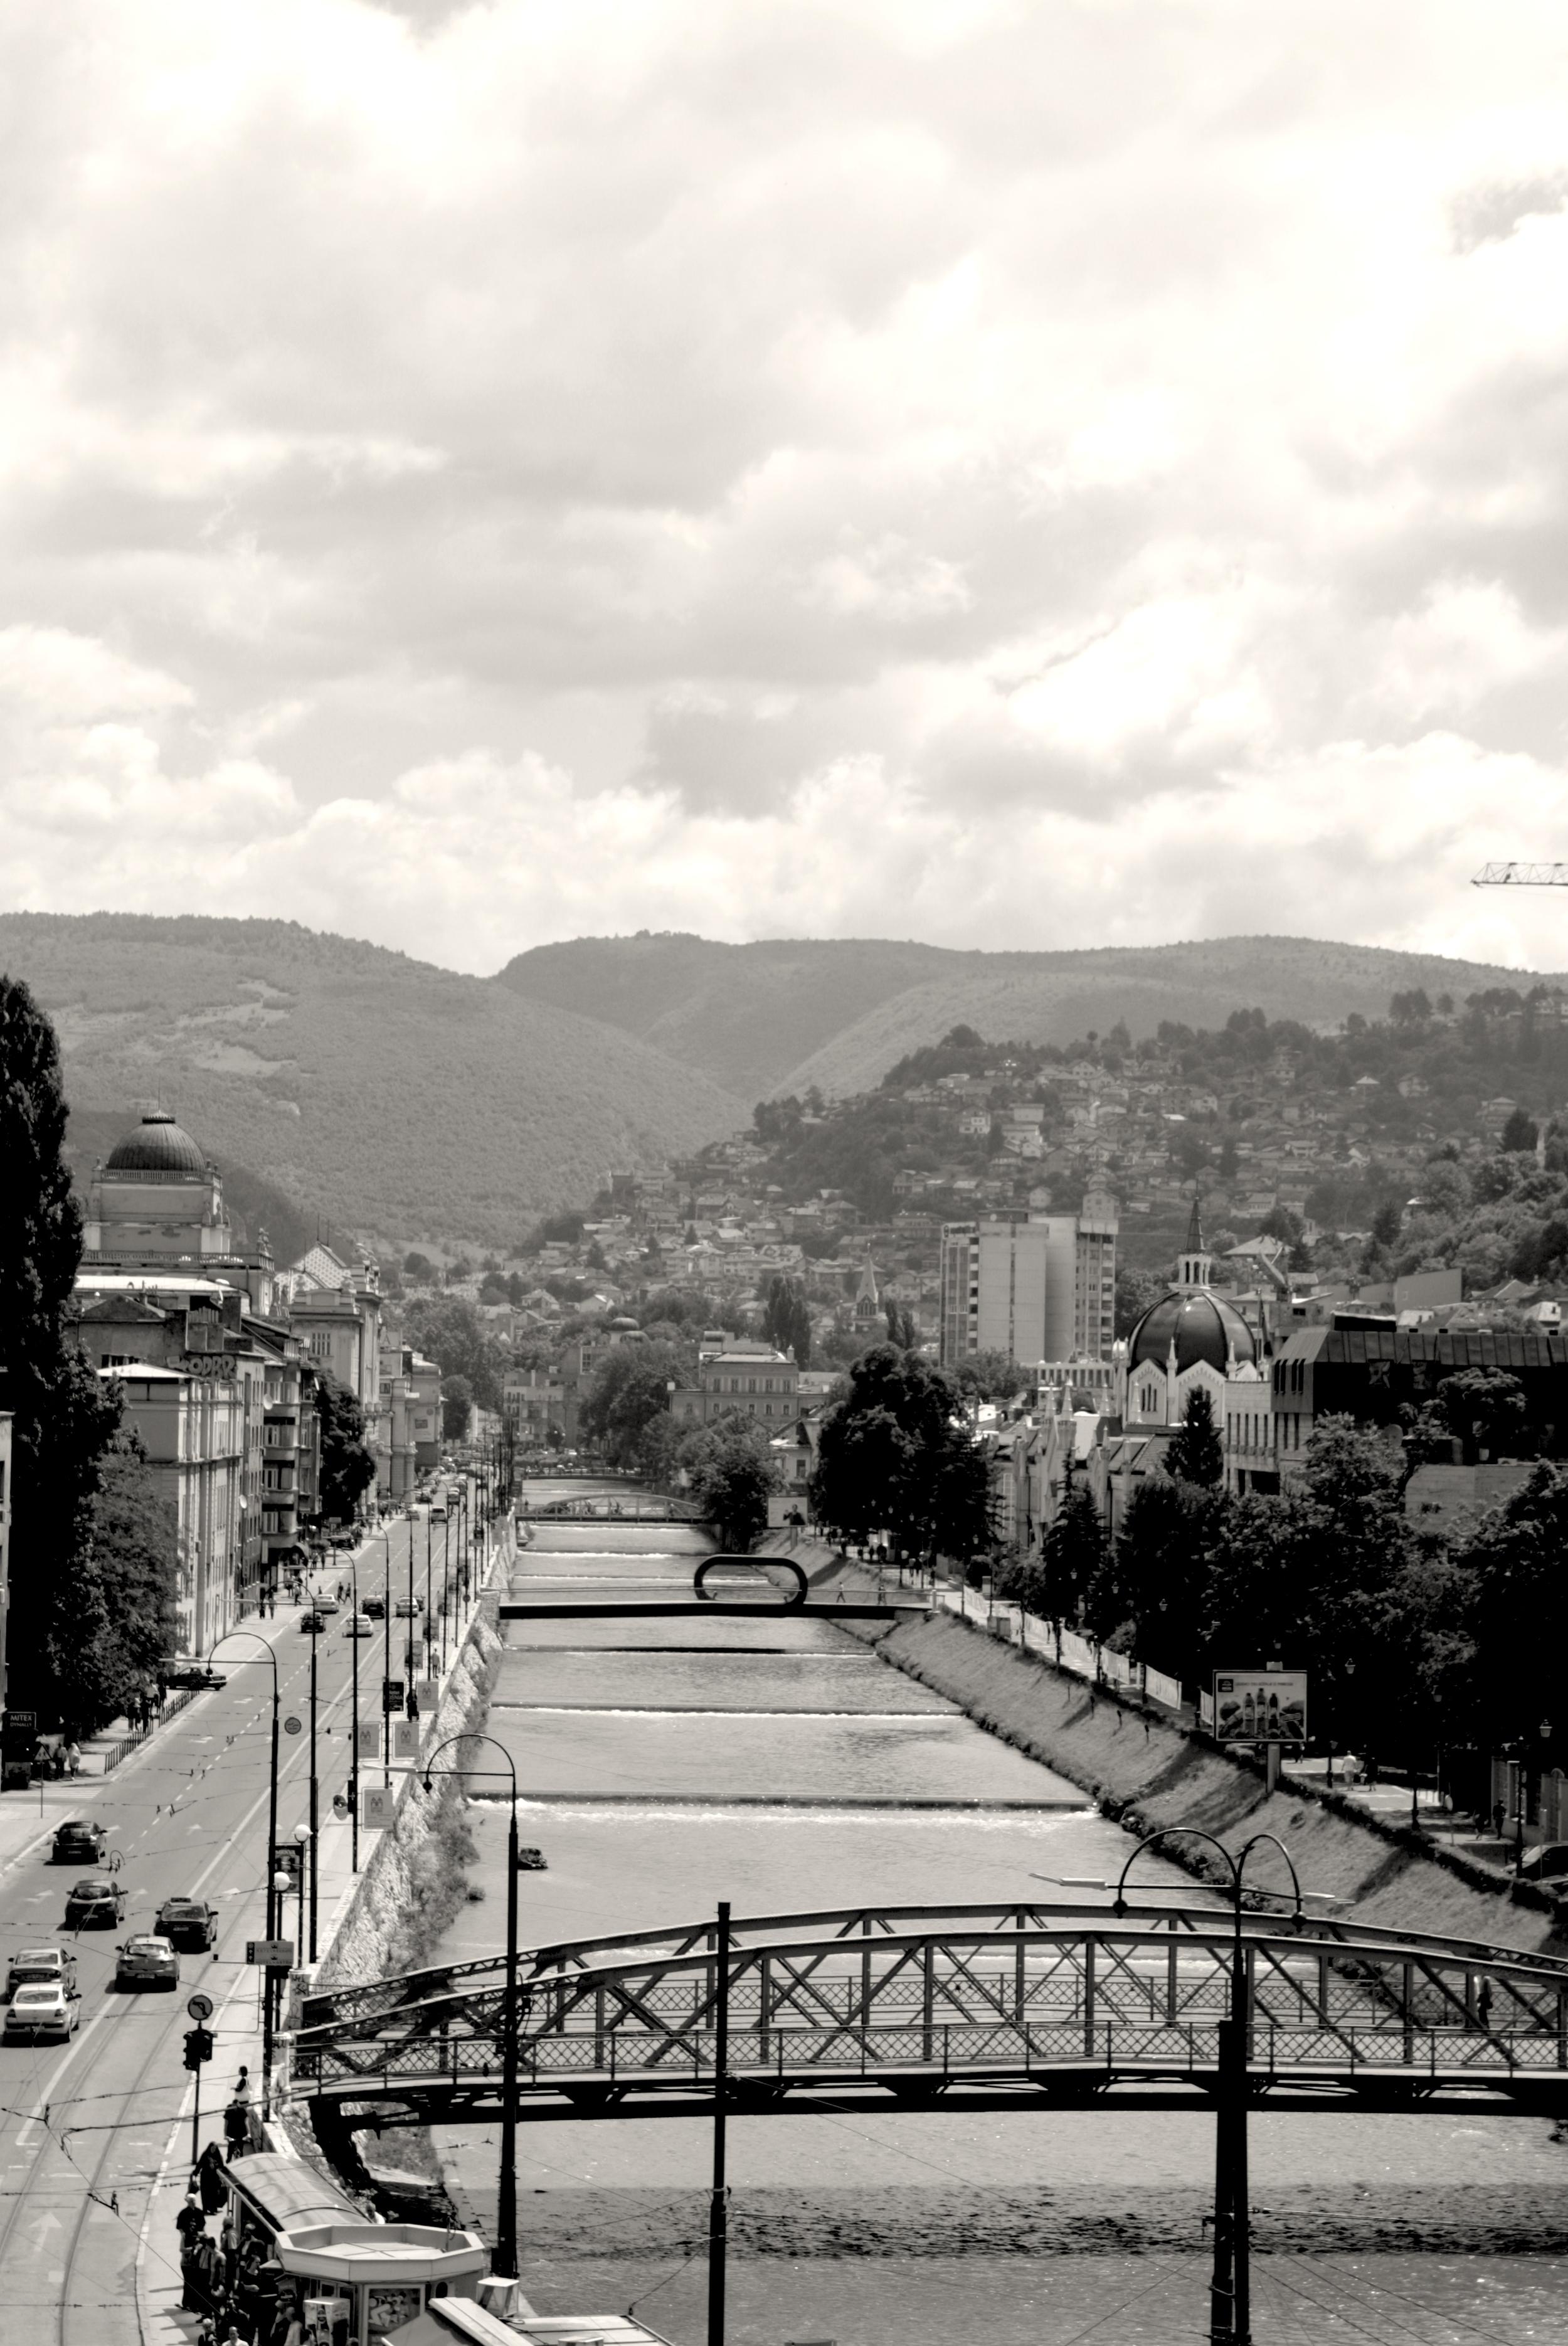 Miljacka, a room with a view